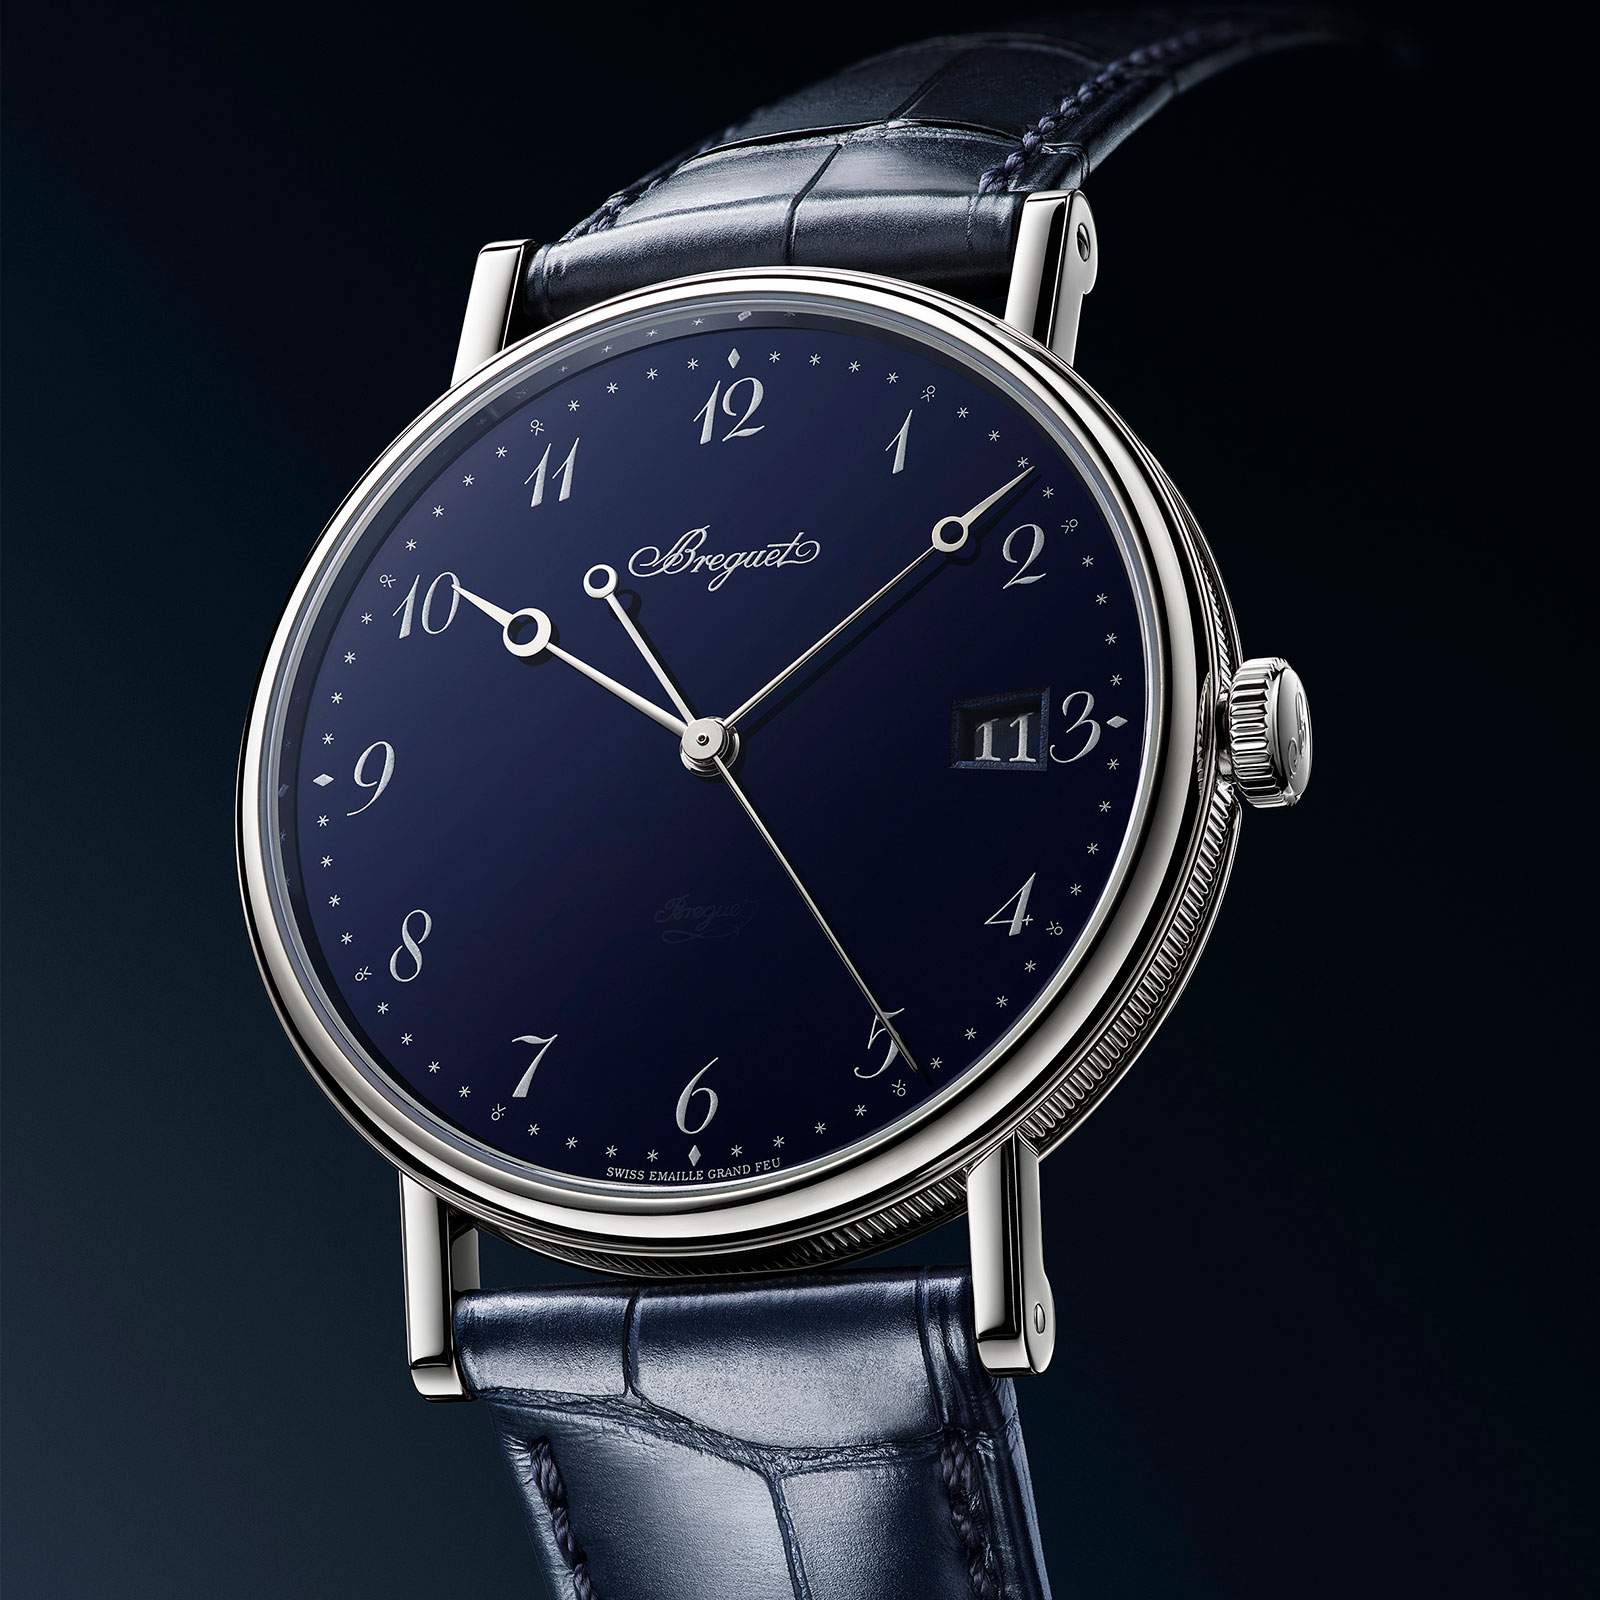 Breguet Classique 5177 blue enamel 3